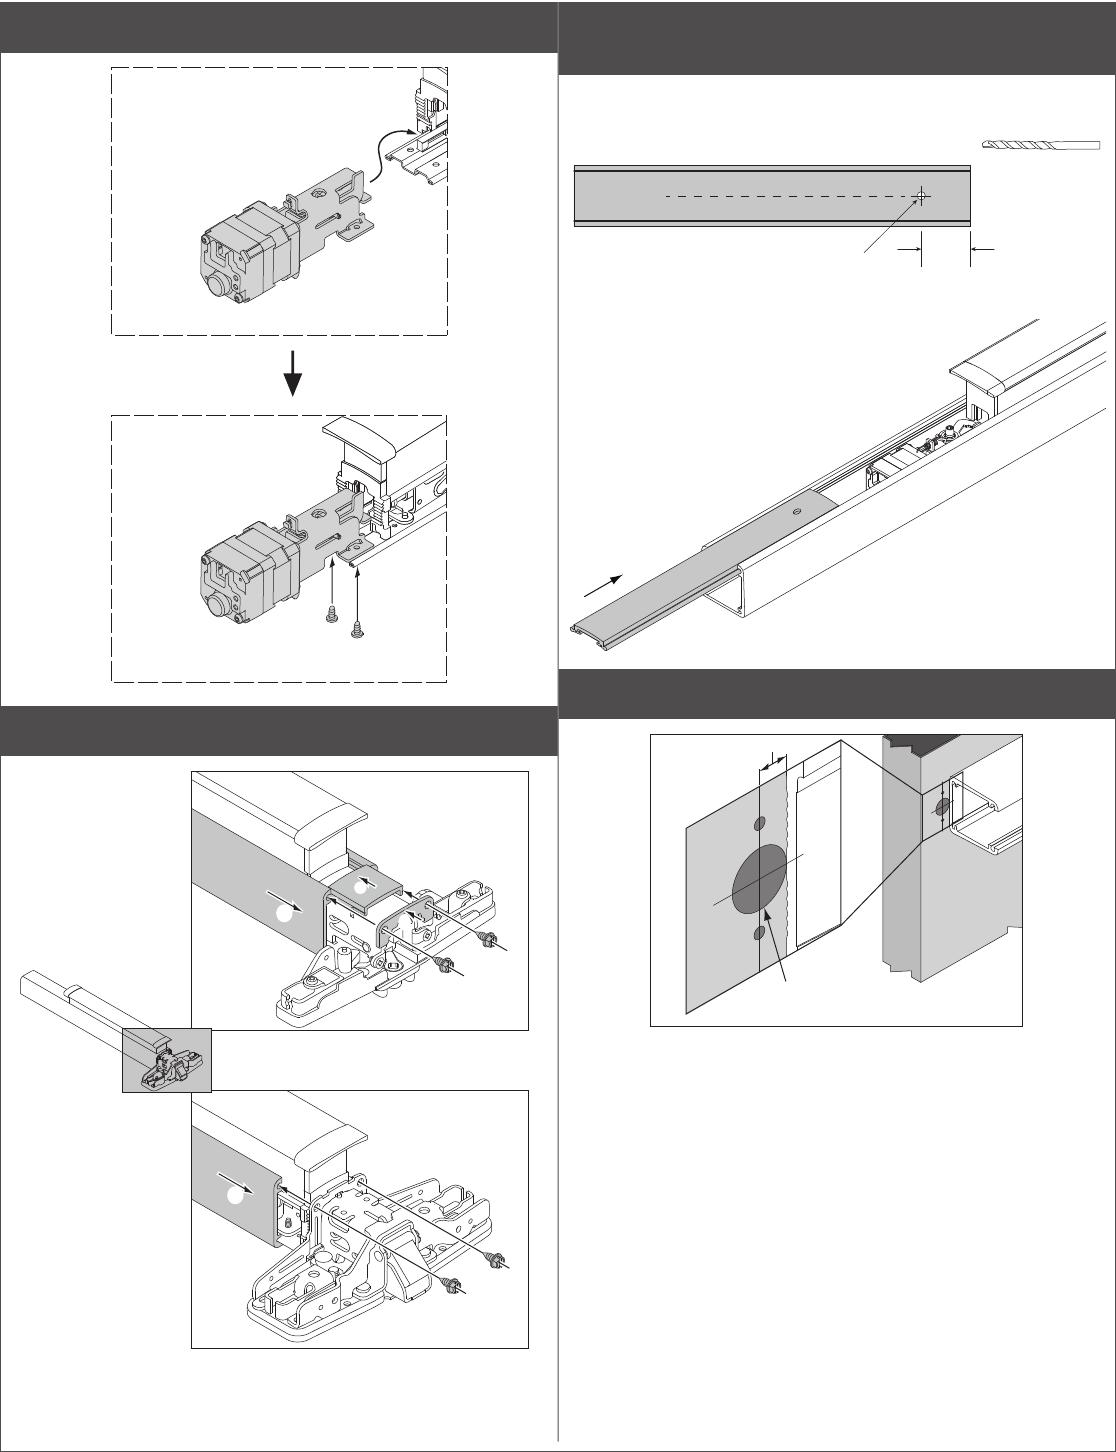 Von Duprin Qel Conversion Kit For 98 99 Series 110745 Ps873 Wiring Diagram 4